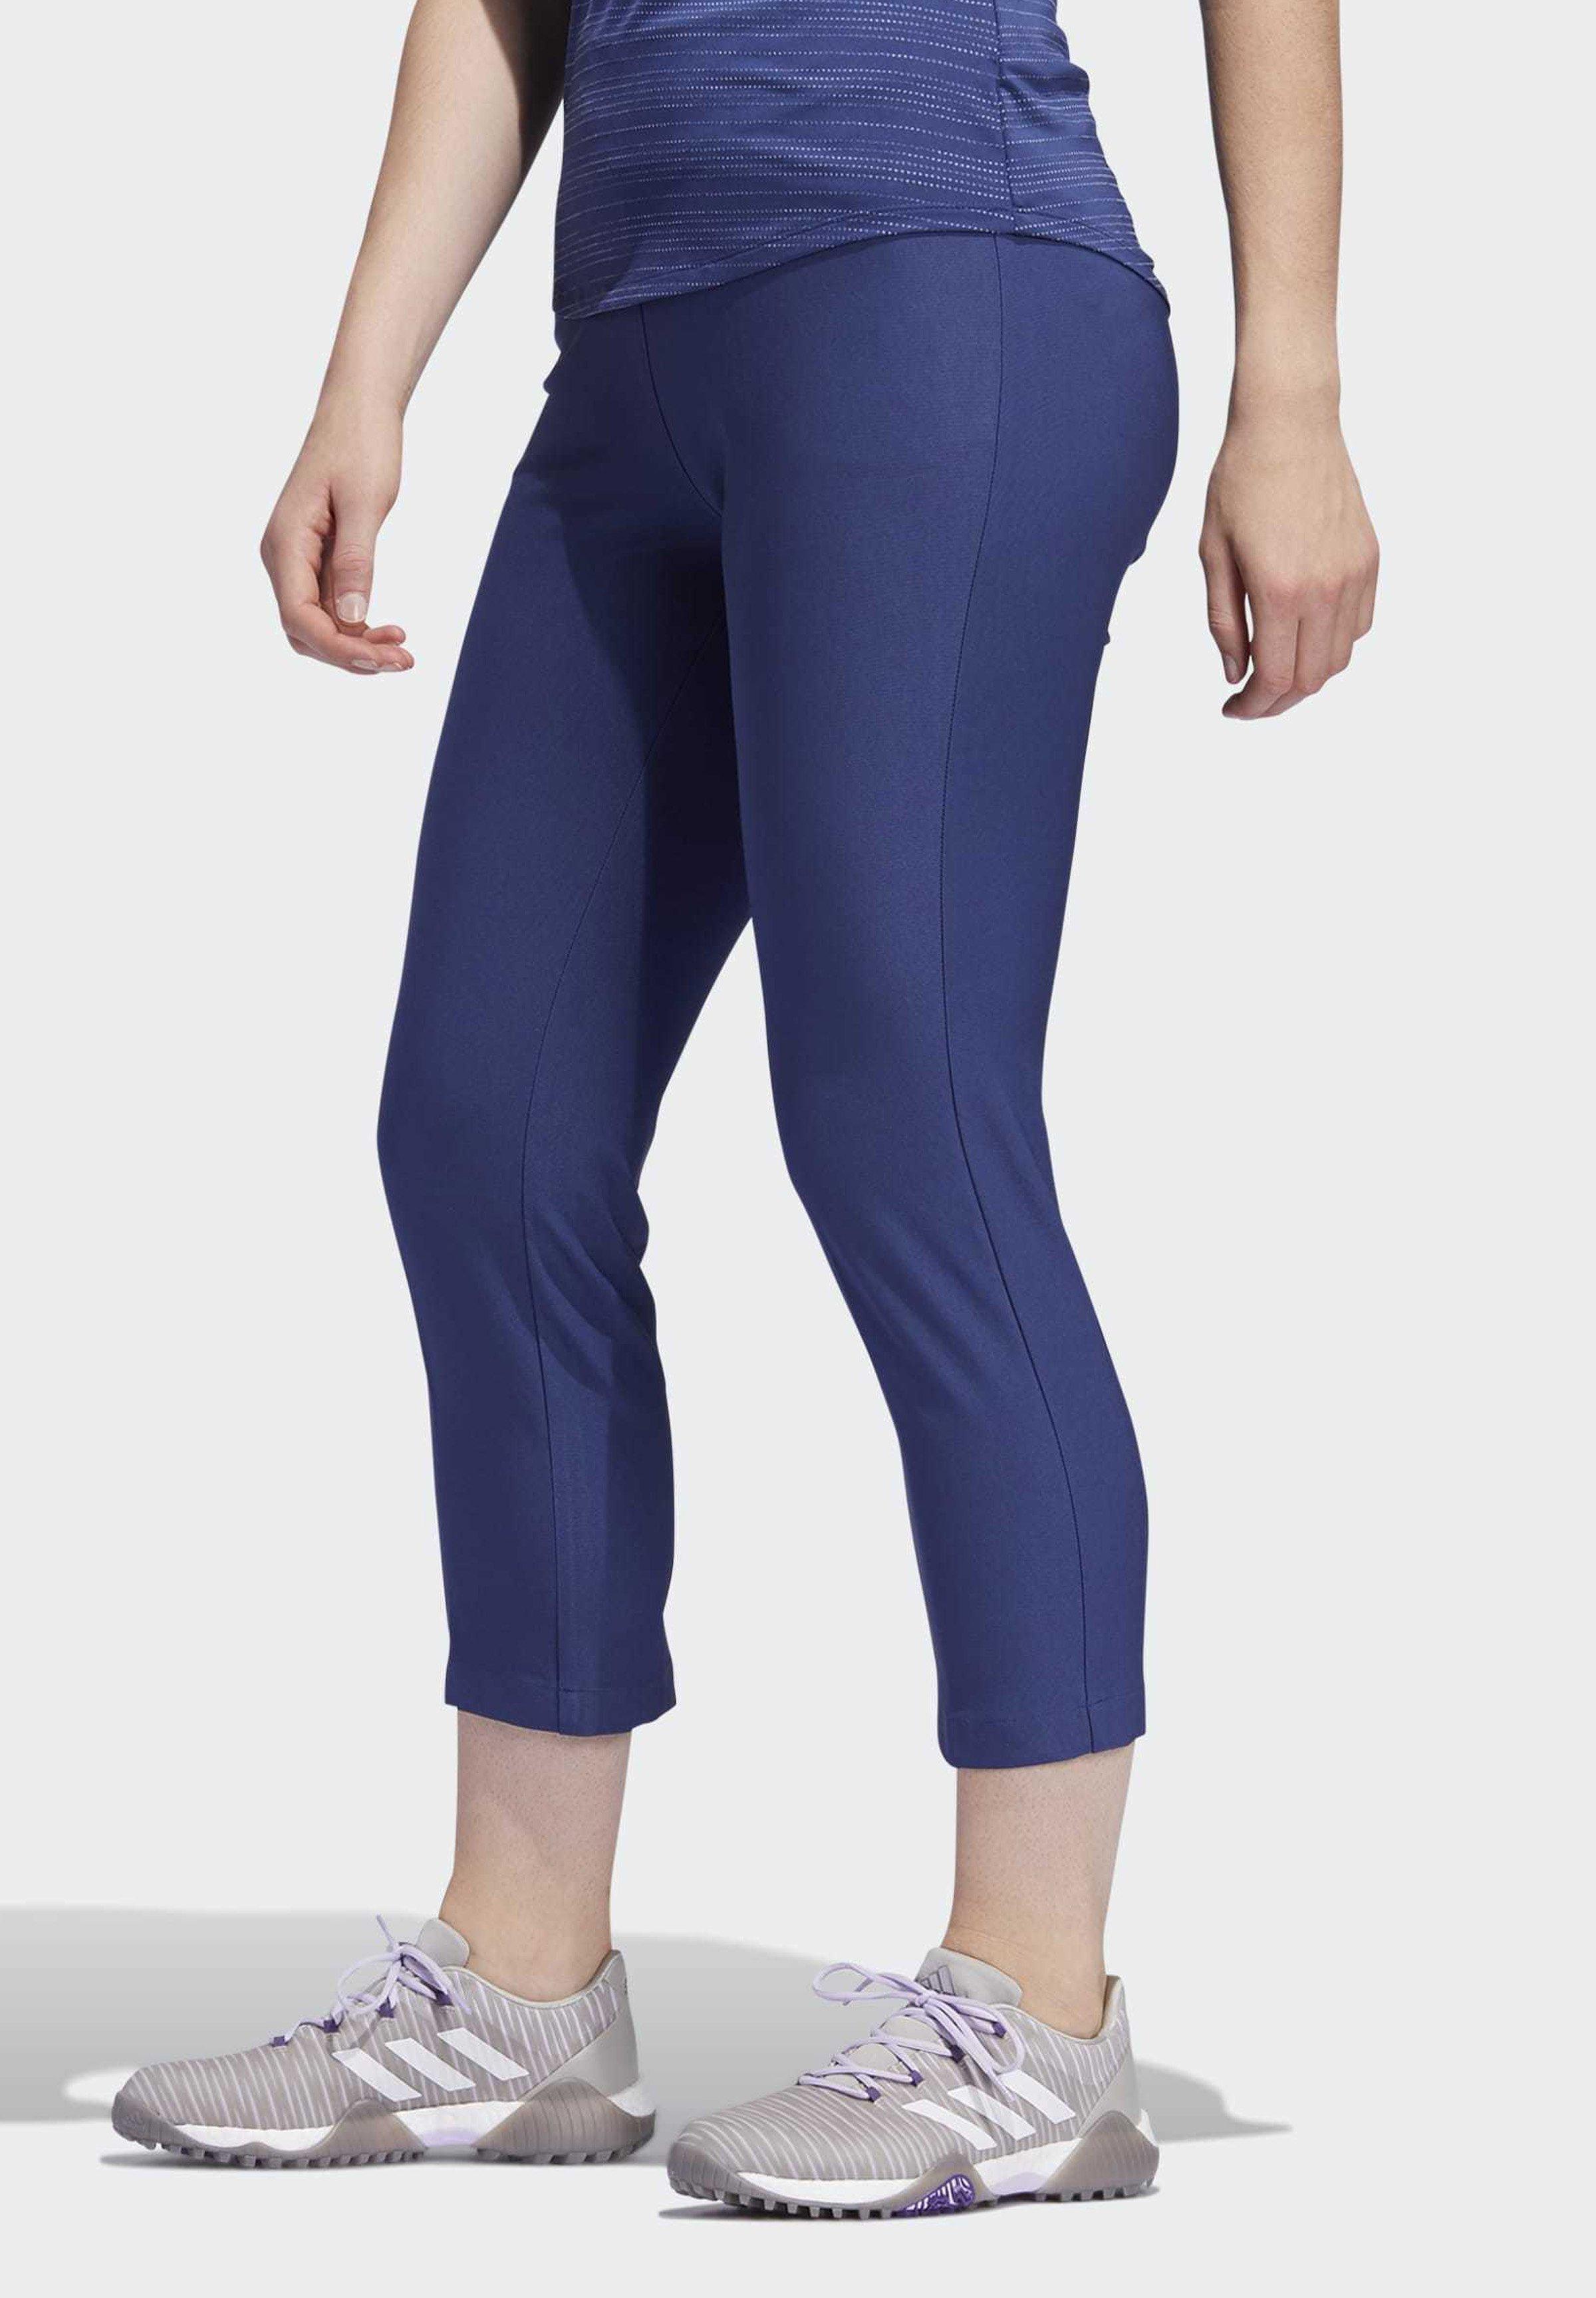 Adidas Performance Ultimate365 Adistar Cropped Pants - Pantalon Classique Blue